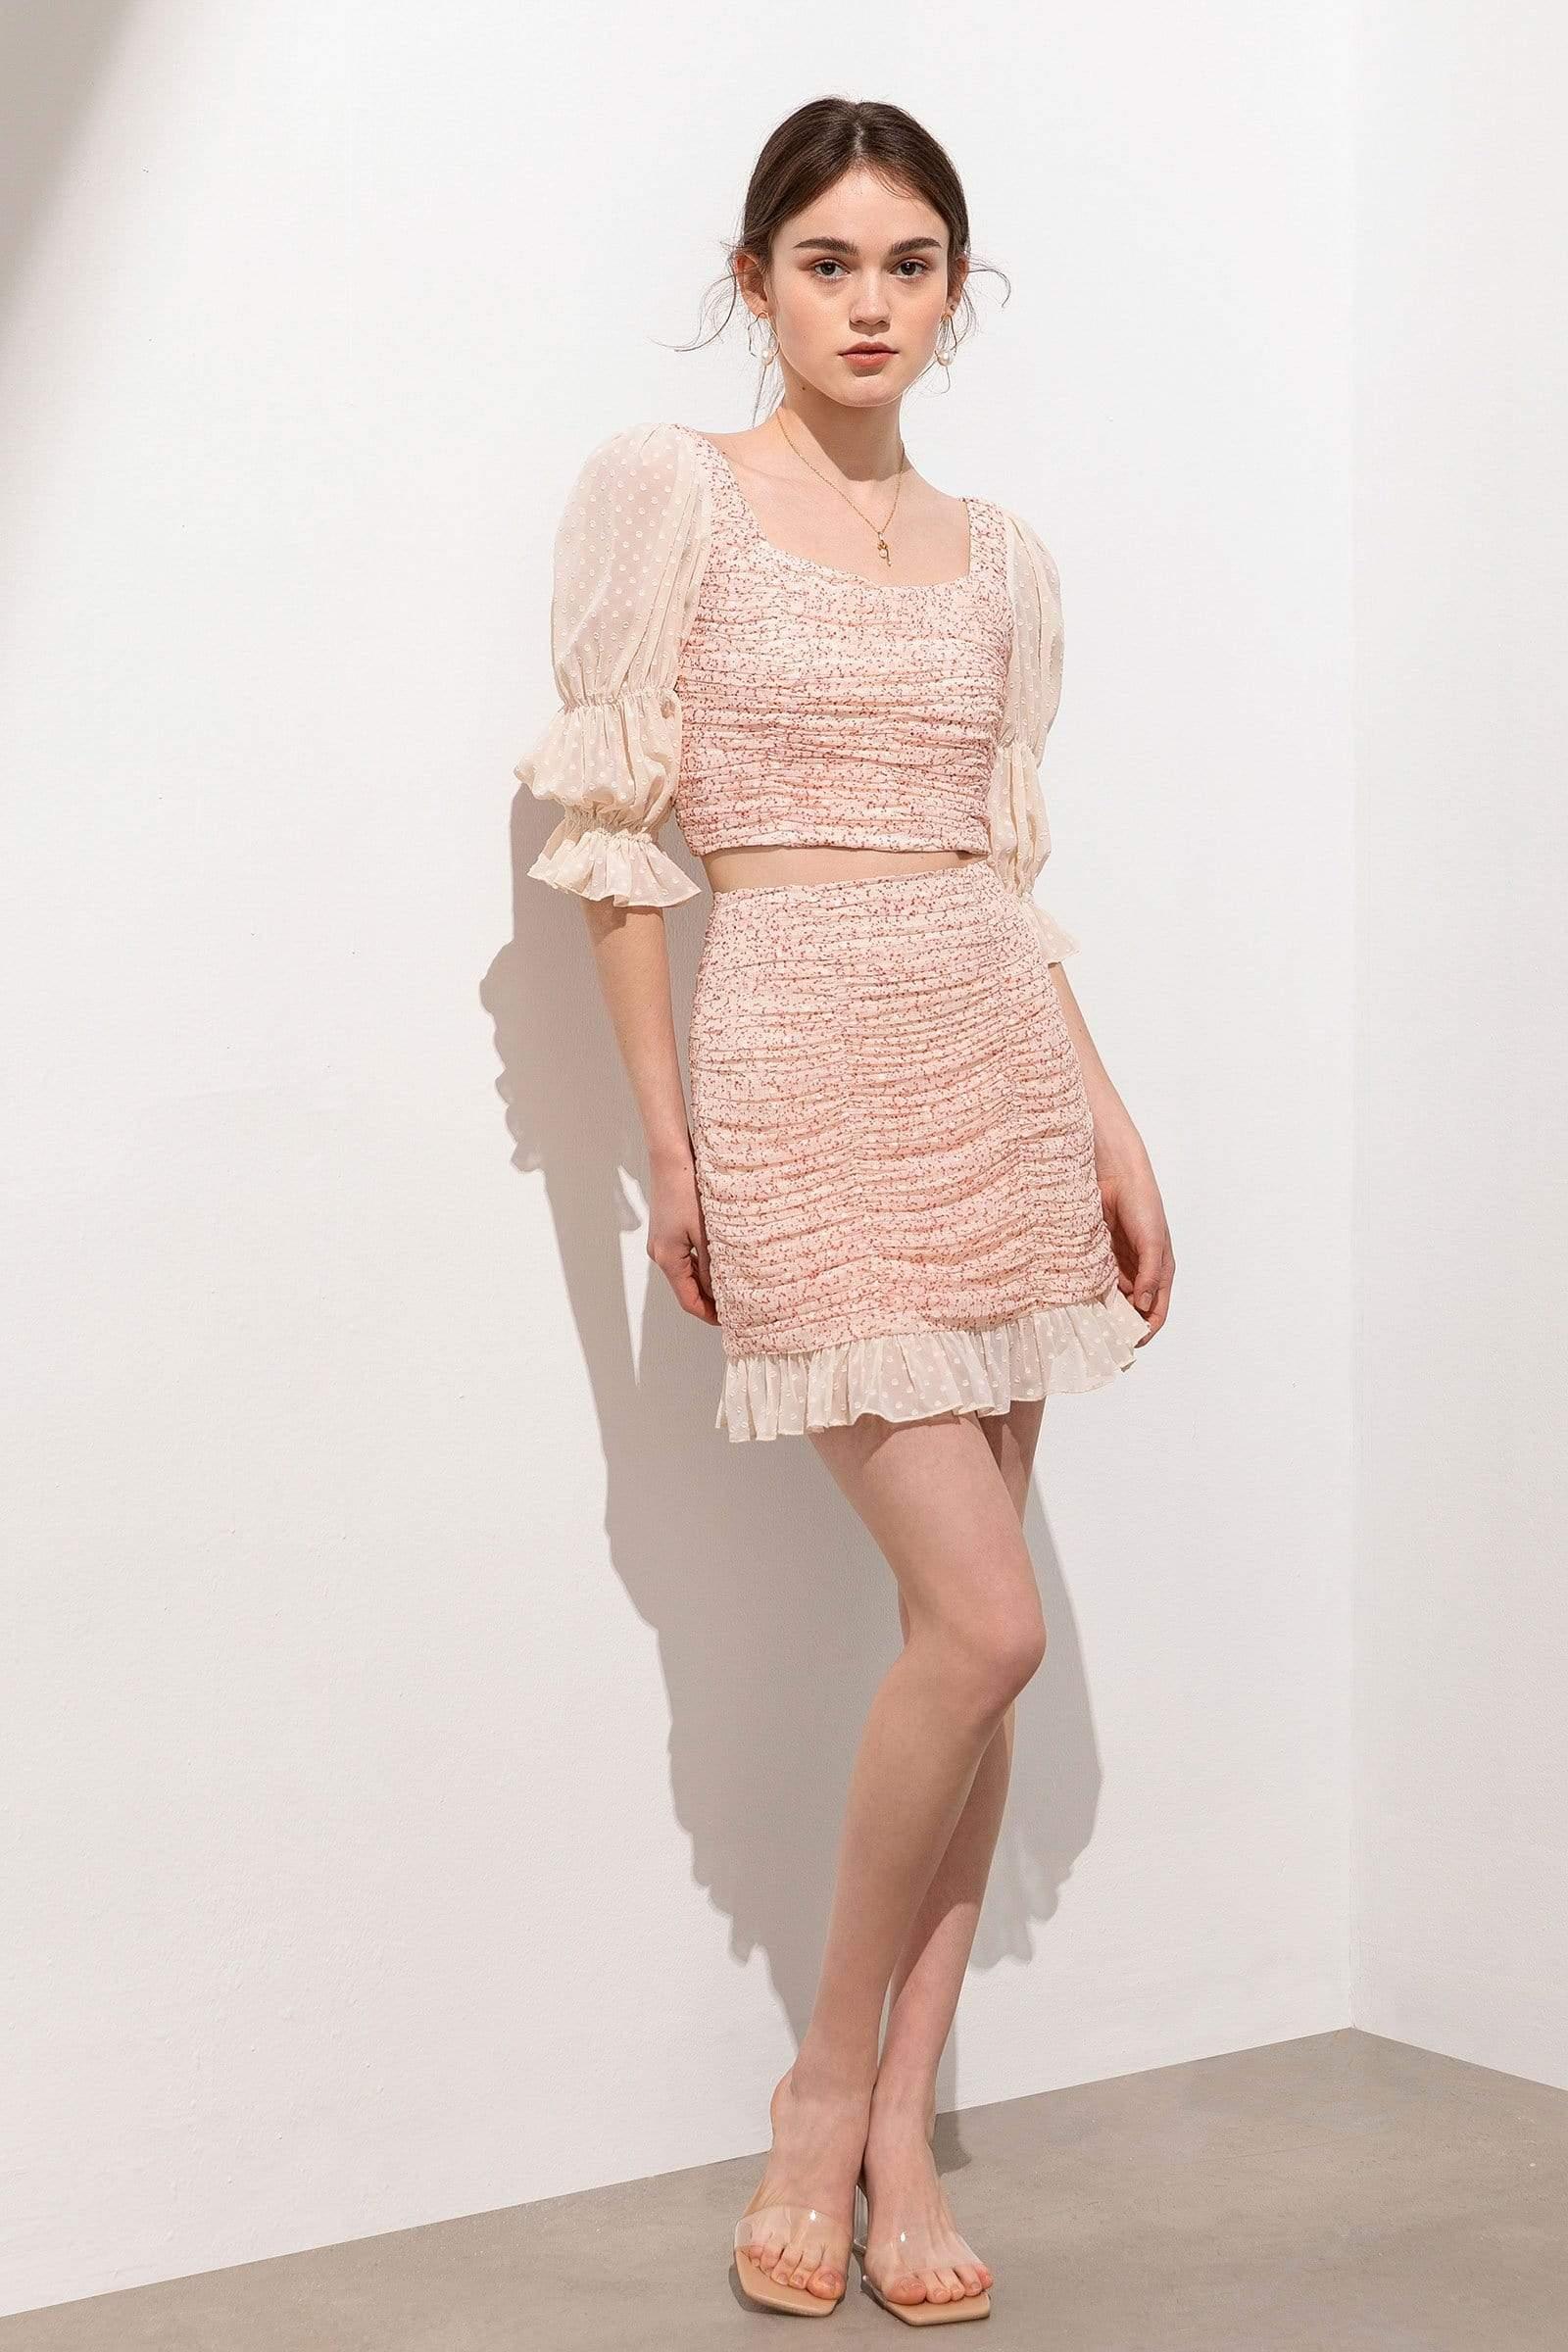 Poppy Dainty Ruffle Hem Mini Skirt